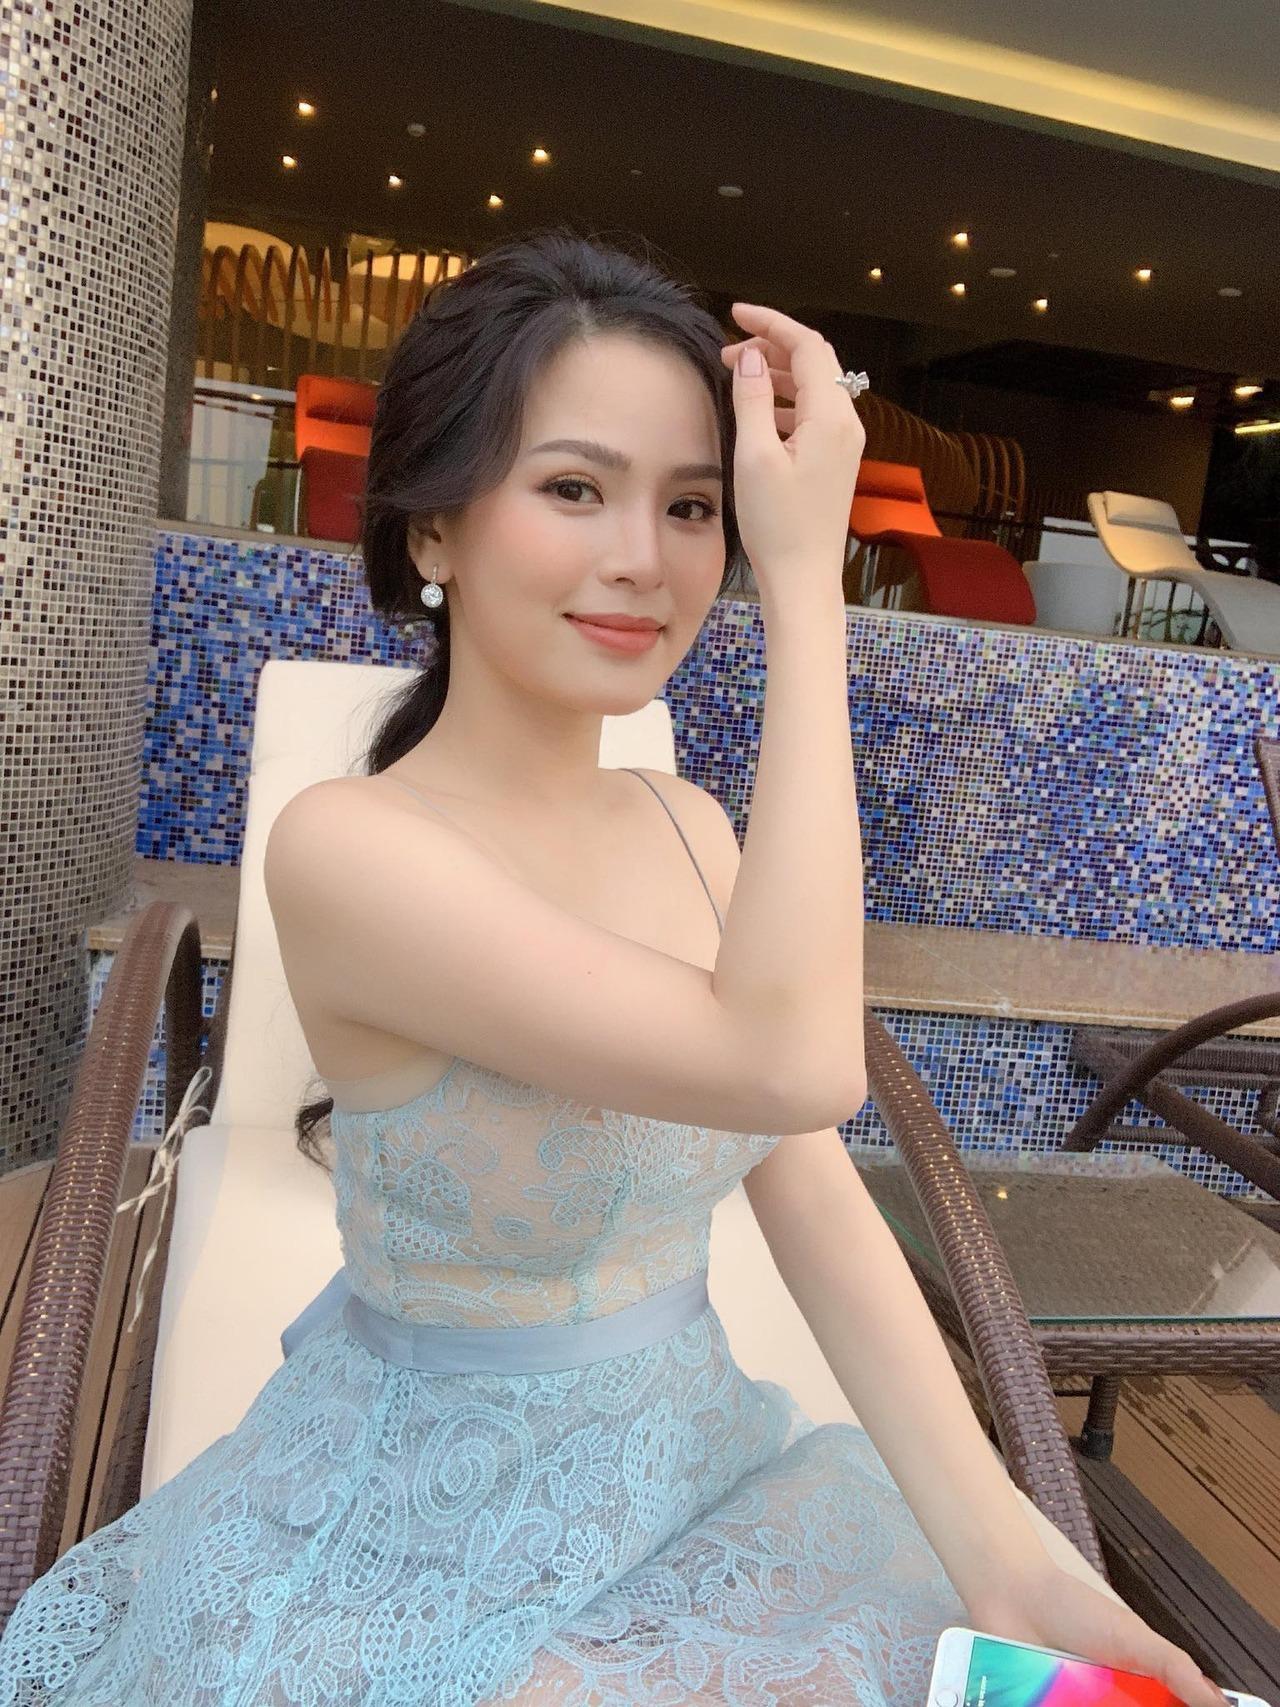 #agirlmagazine #sose.xyz #vietnamesegirls #vietnamesehotgirl